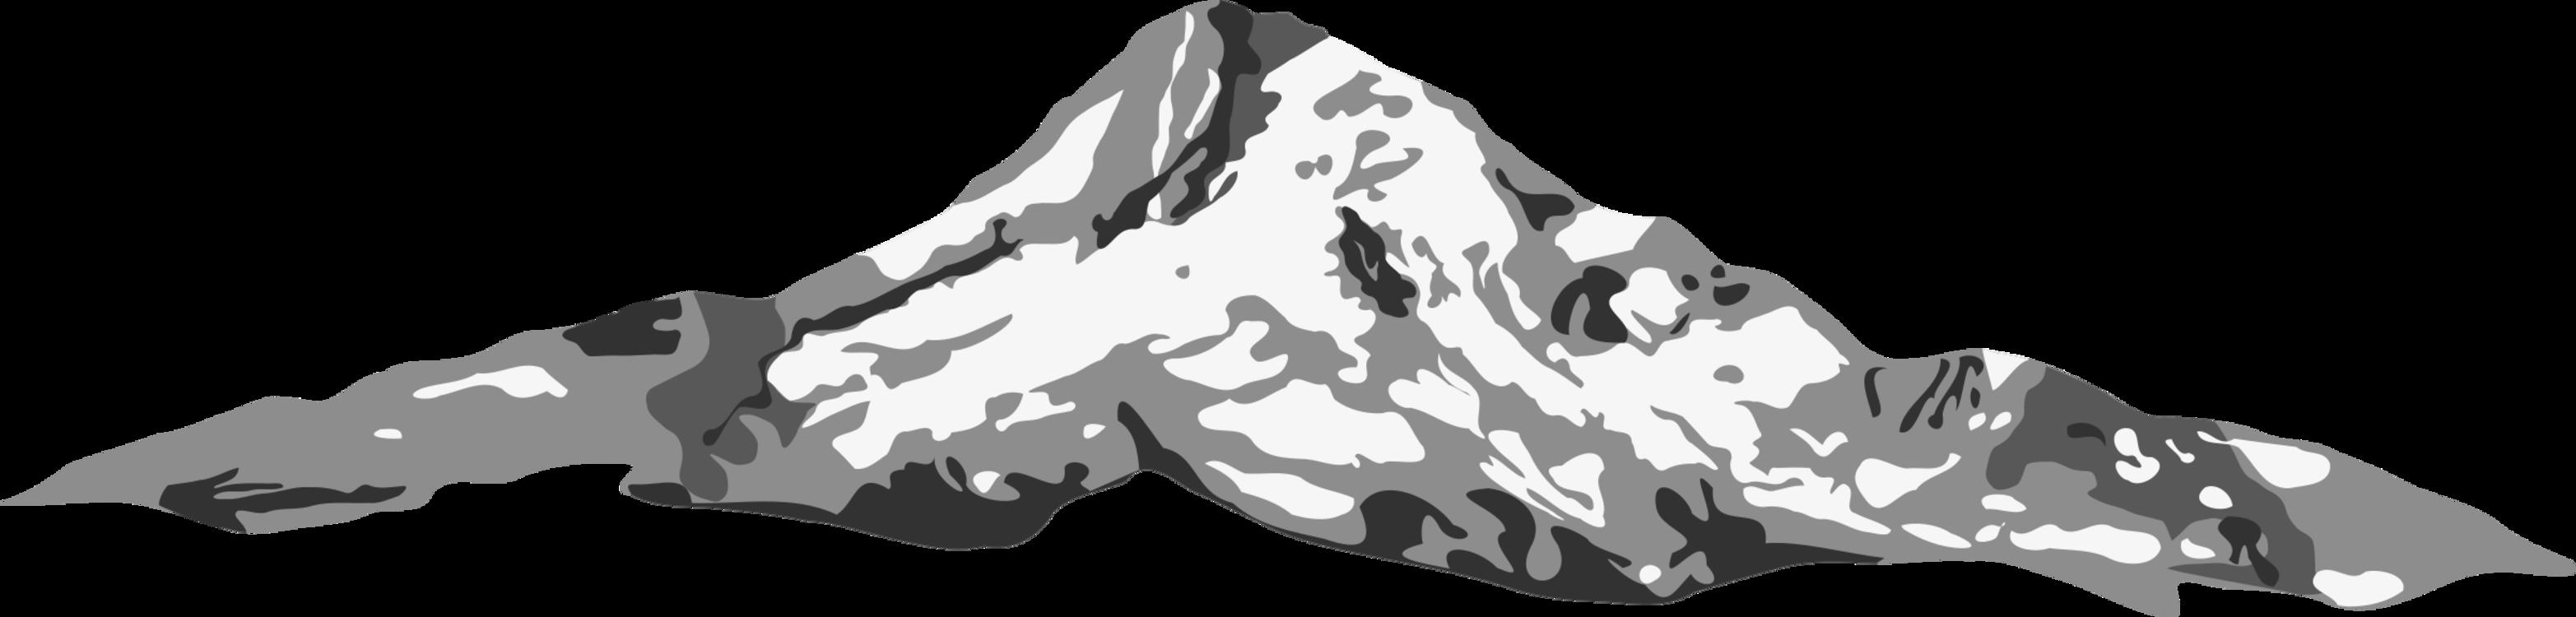 Angle,Tree,Monochrome